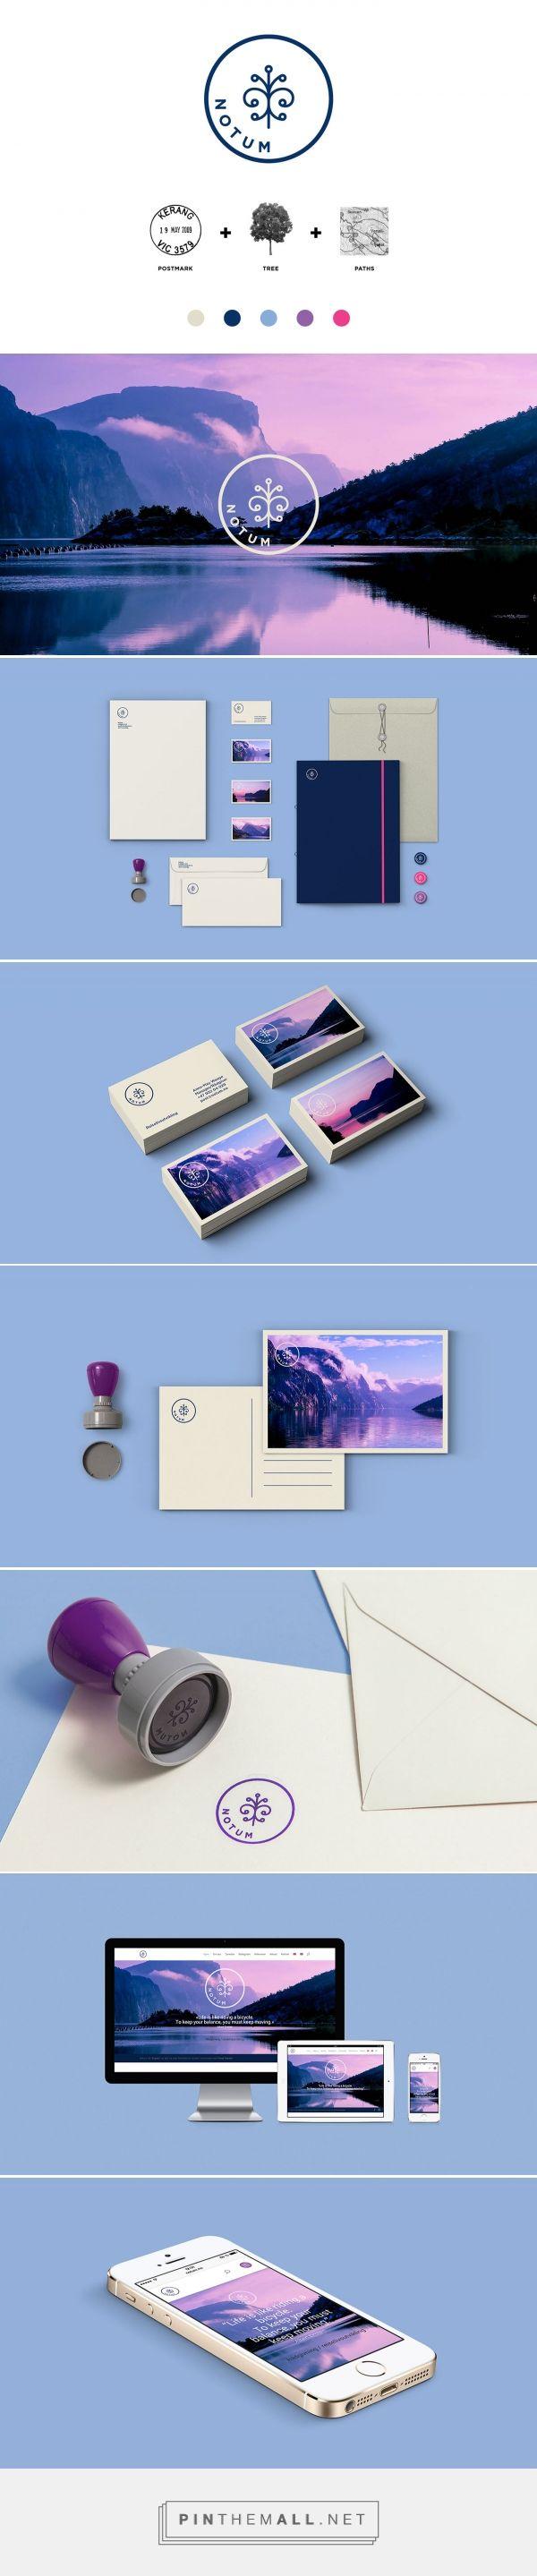 Notum, tour operation company / branding and design by Daniel Brokstad